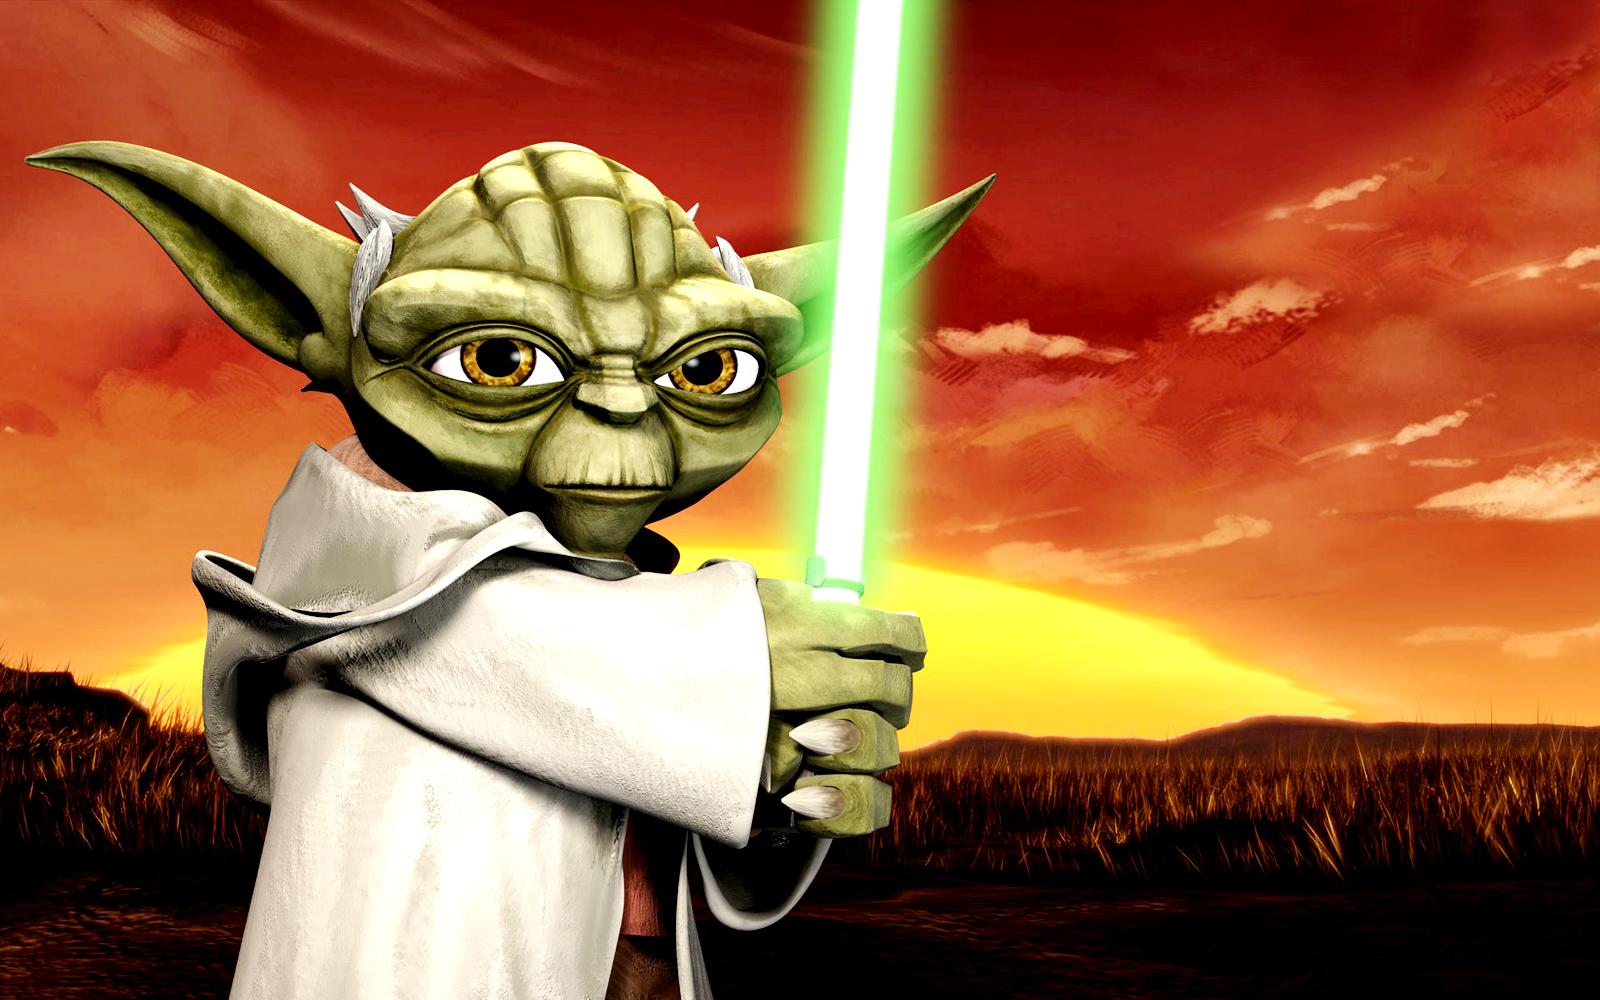 Master Yoda Star Wars HD Wallpapers | Desktop Wallpapers